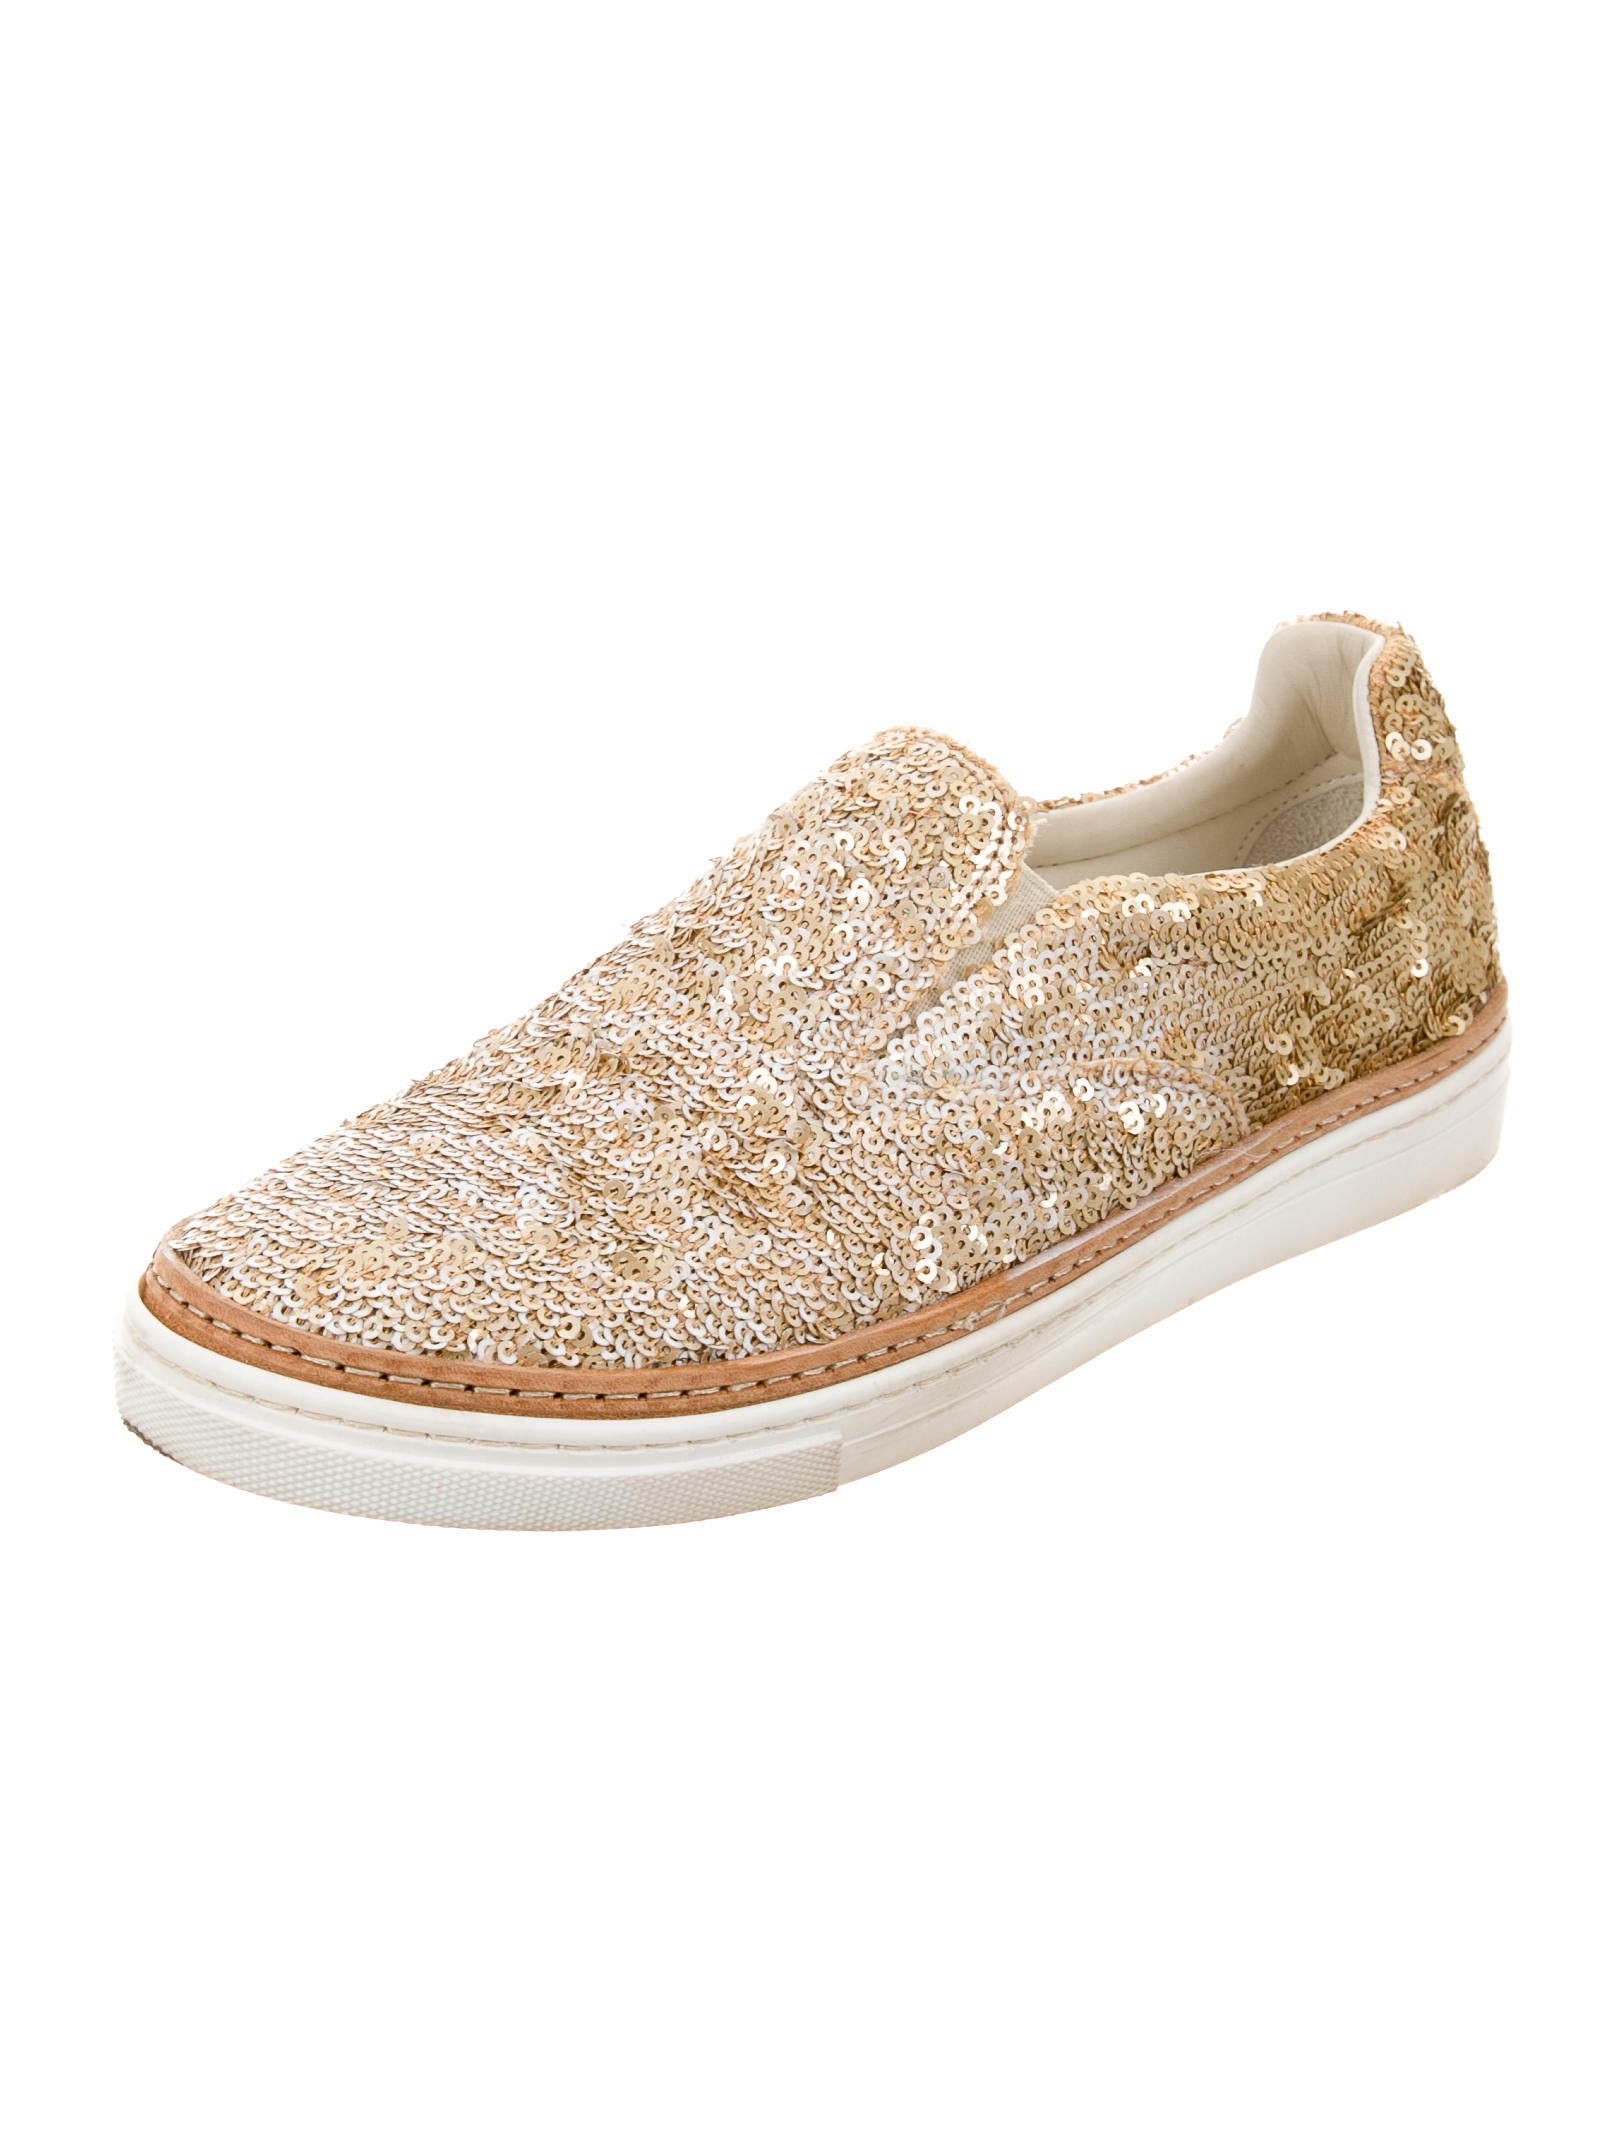 maison martin margiela sequin embellished slip on sneakers